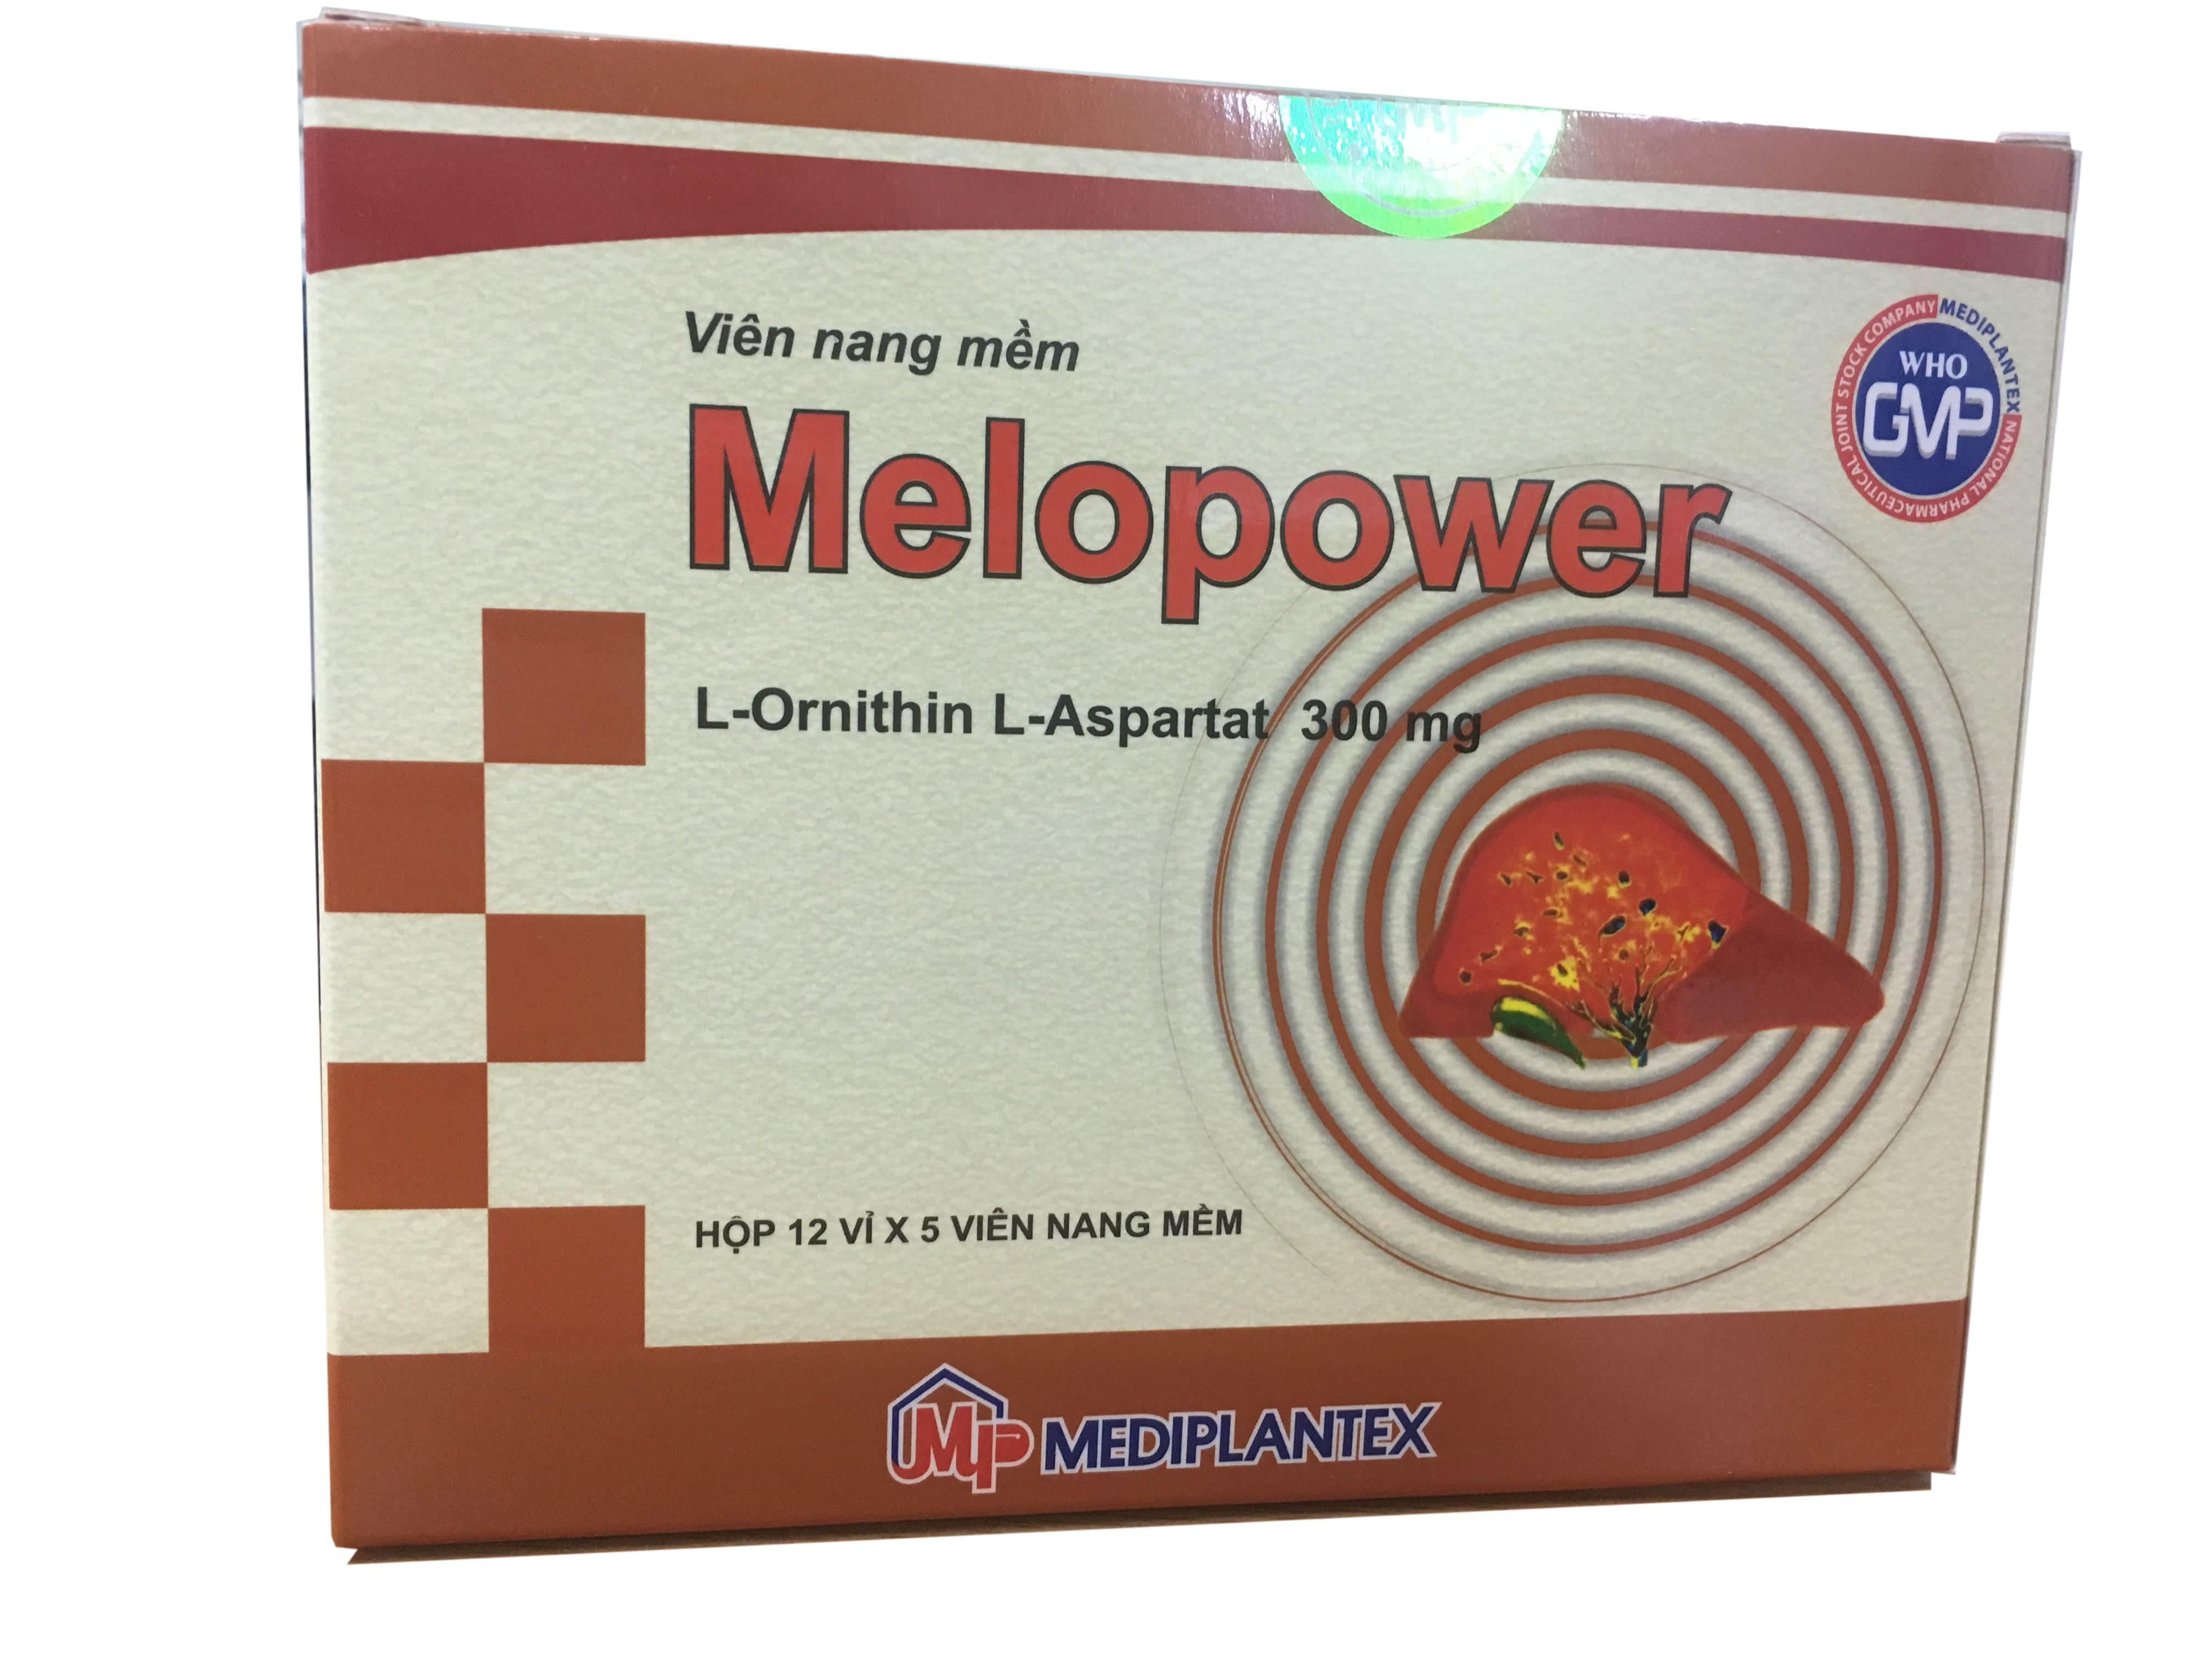 Melopower